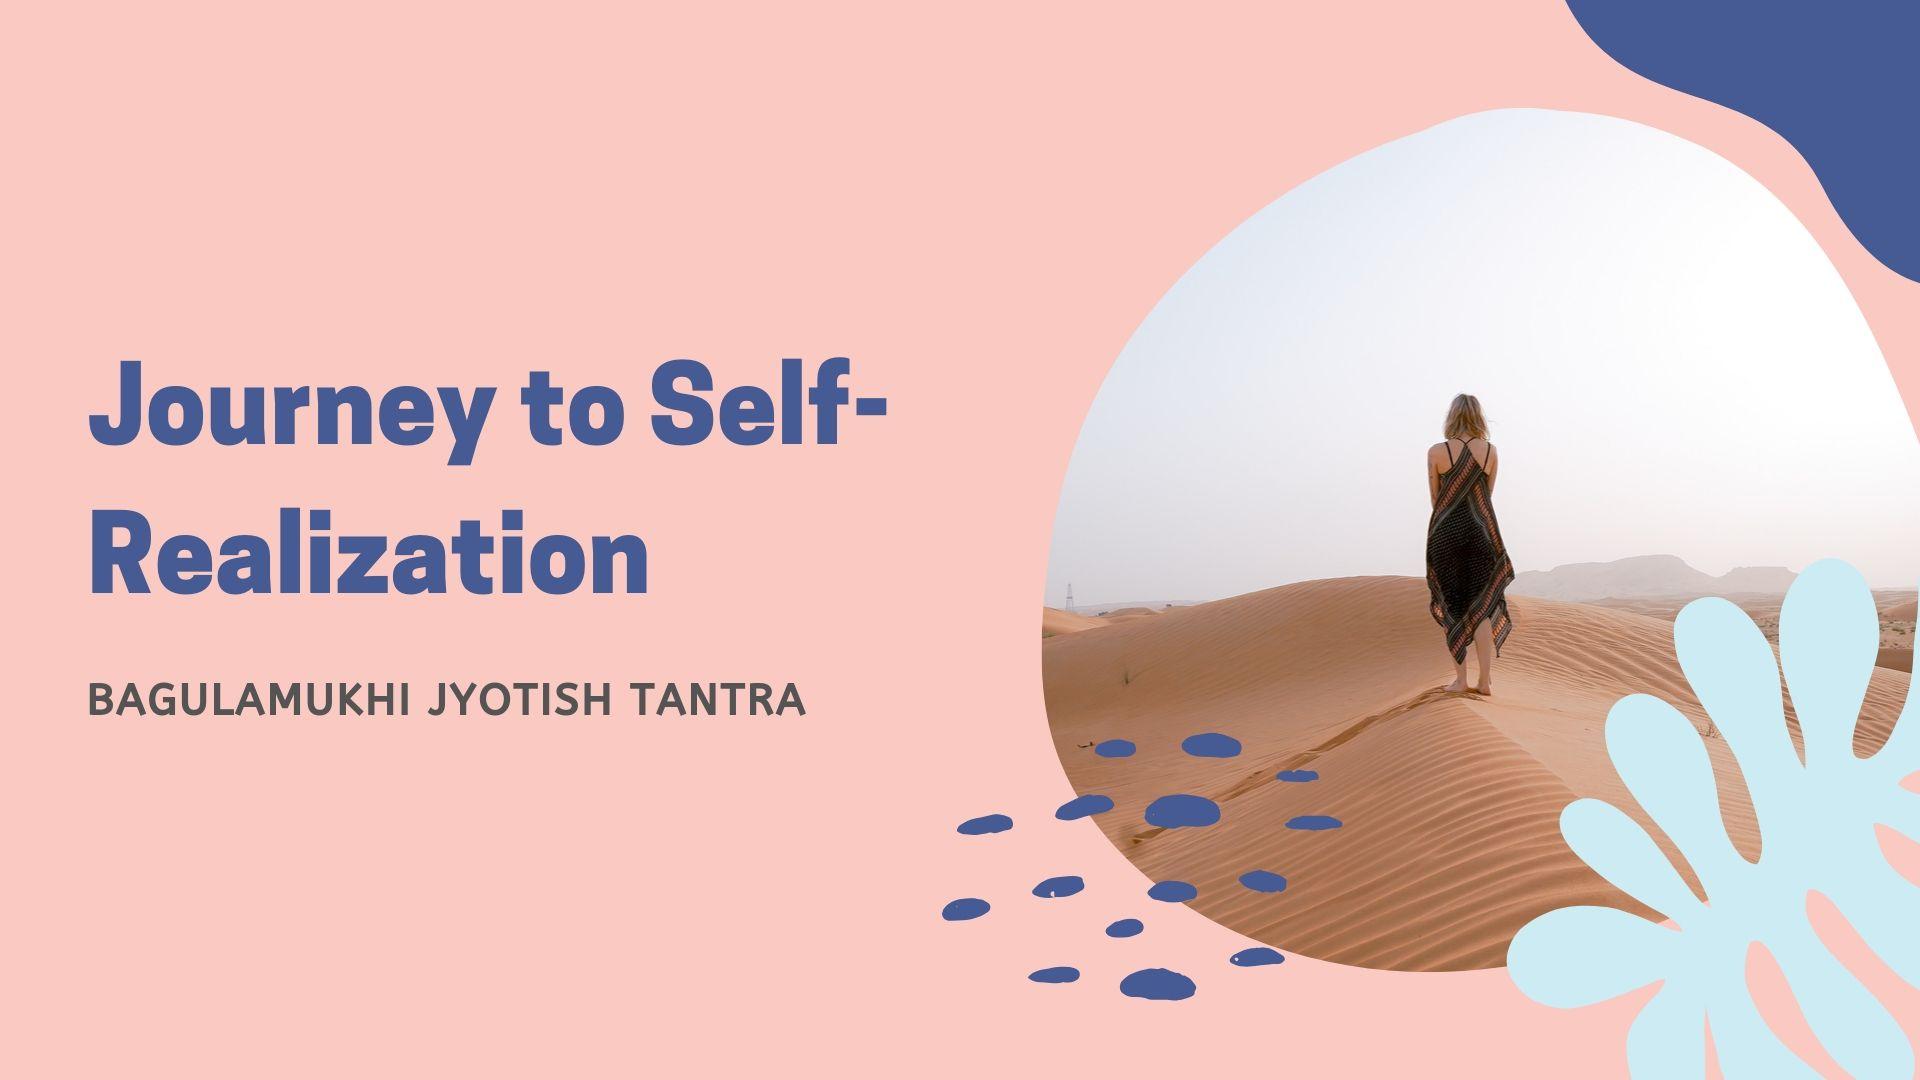 Journey to self- realization